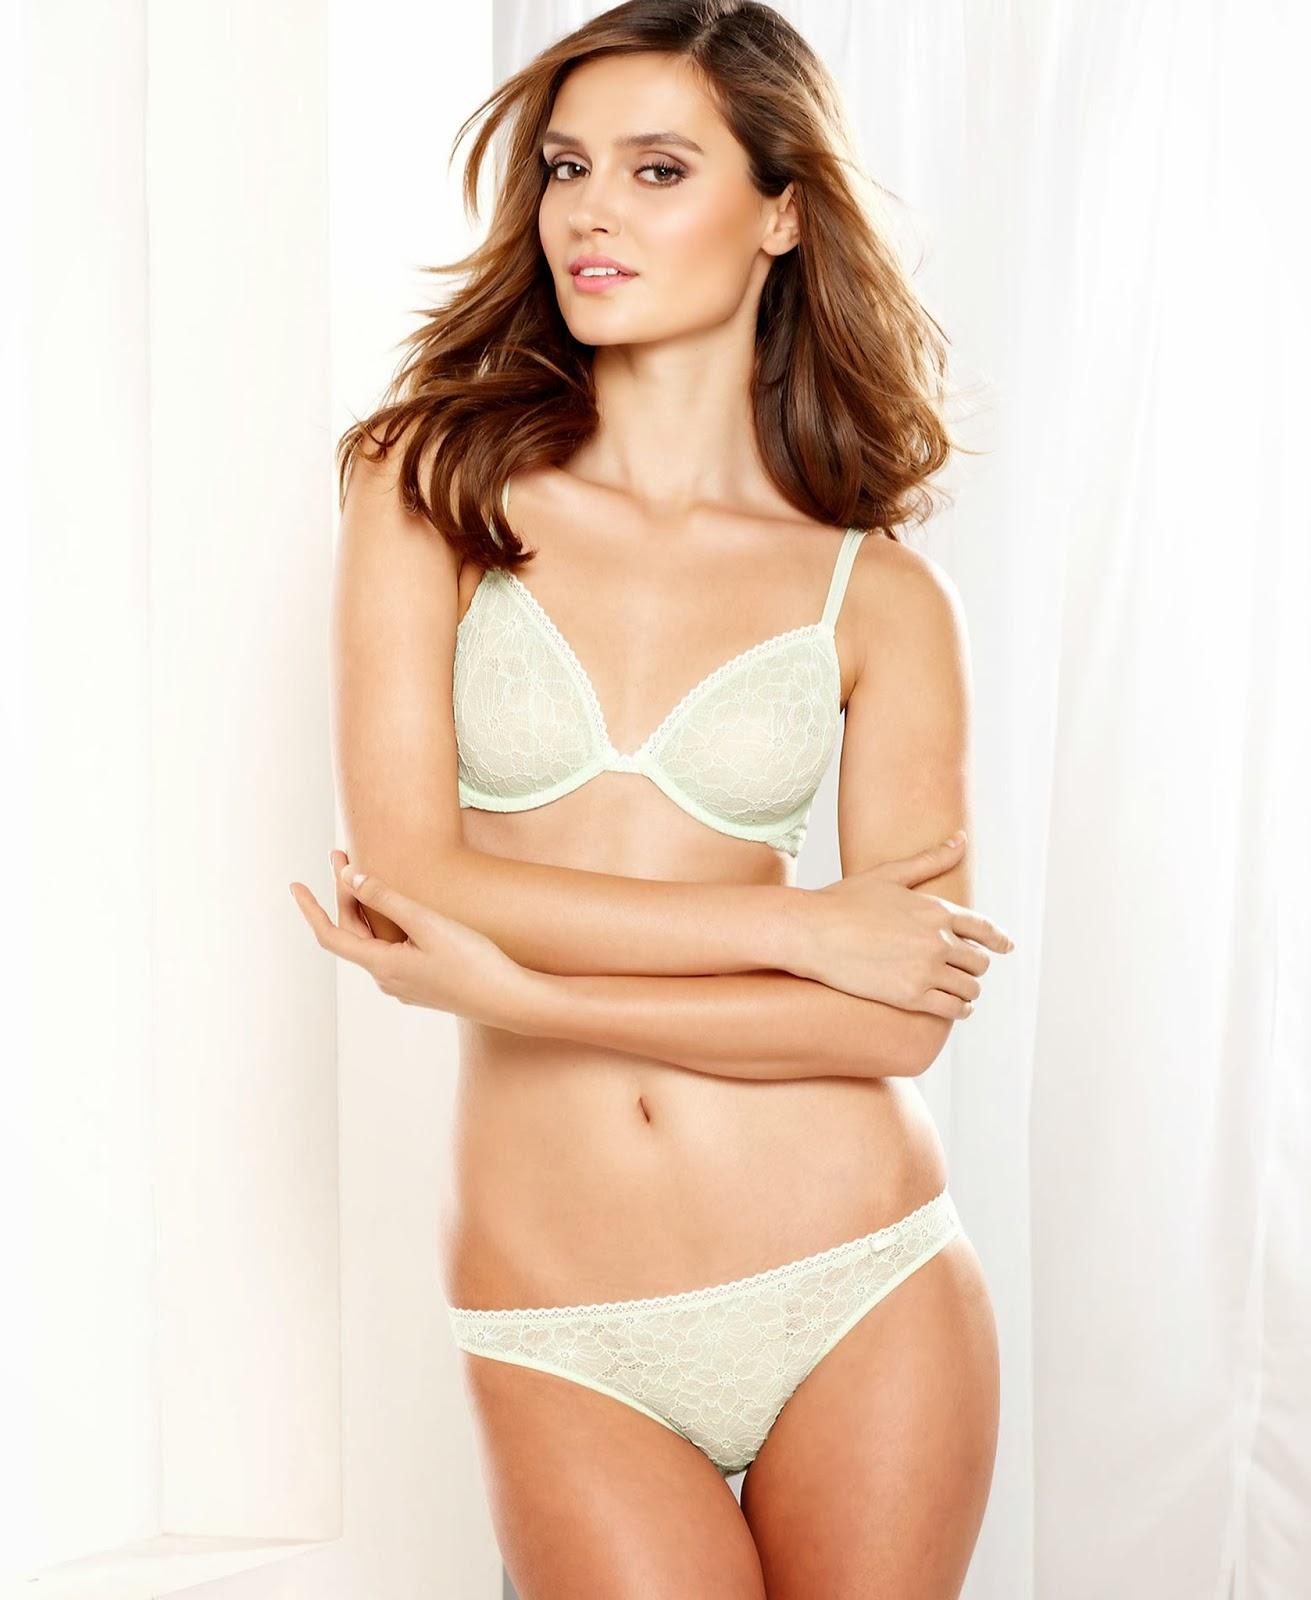 Model Photos: Tania Onishchenko - Macys Lingerie: model-photos-modeling.blogspot.com/2014/02/tania-onishchenko-macys...